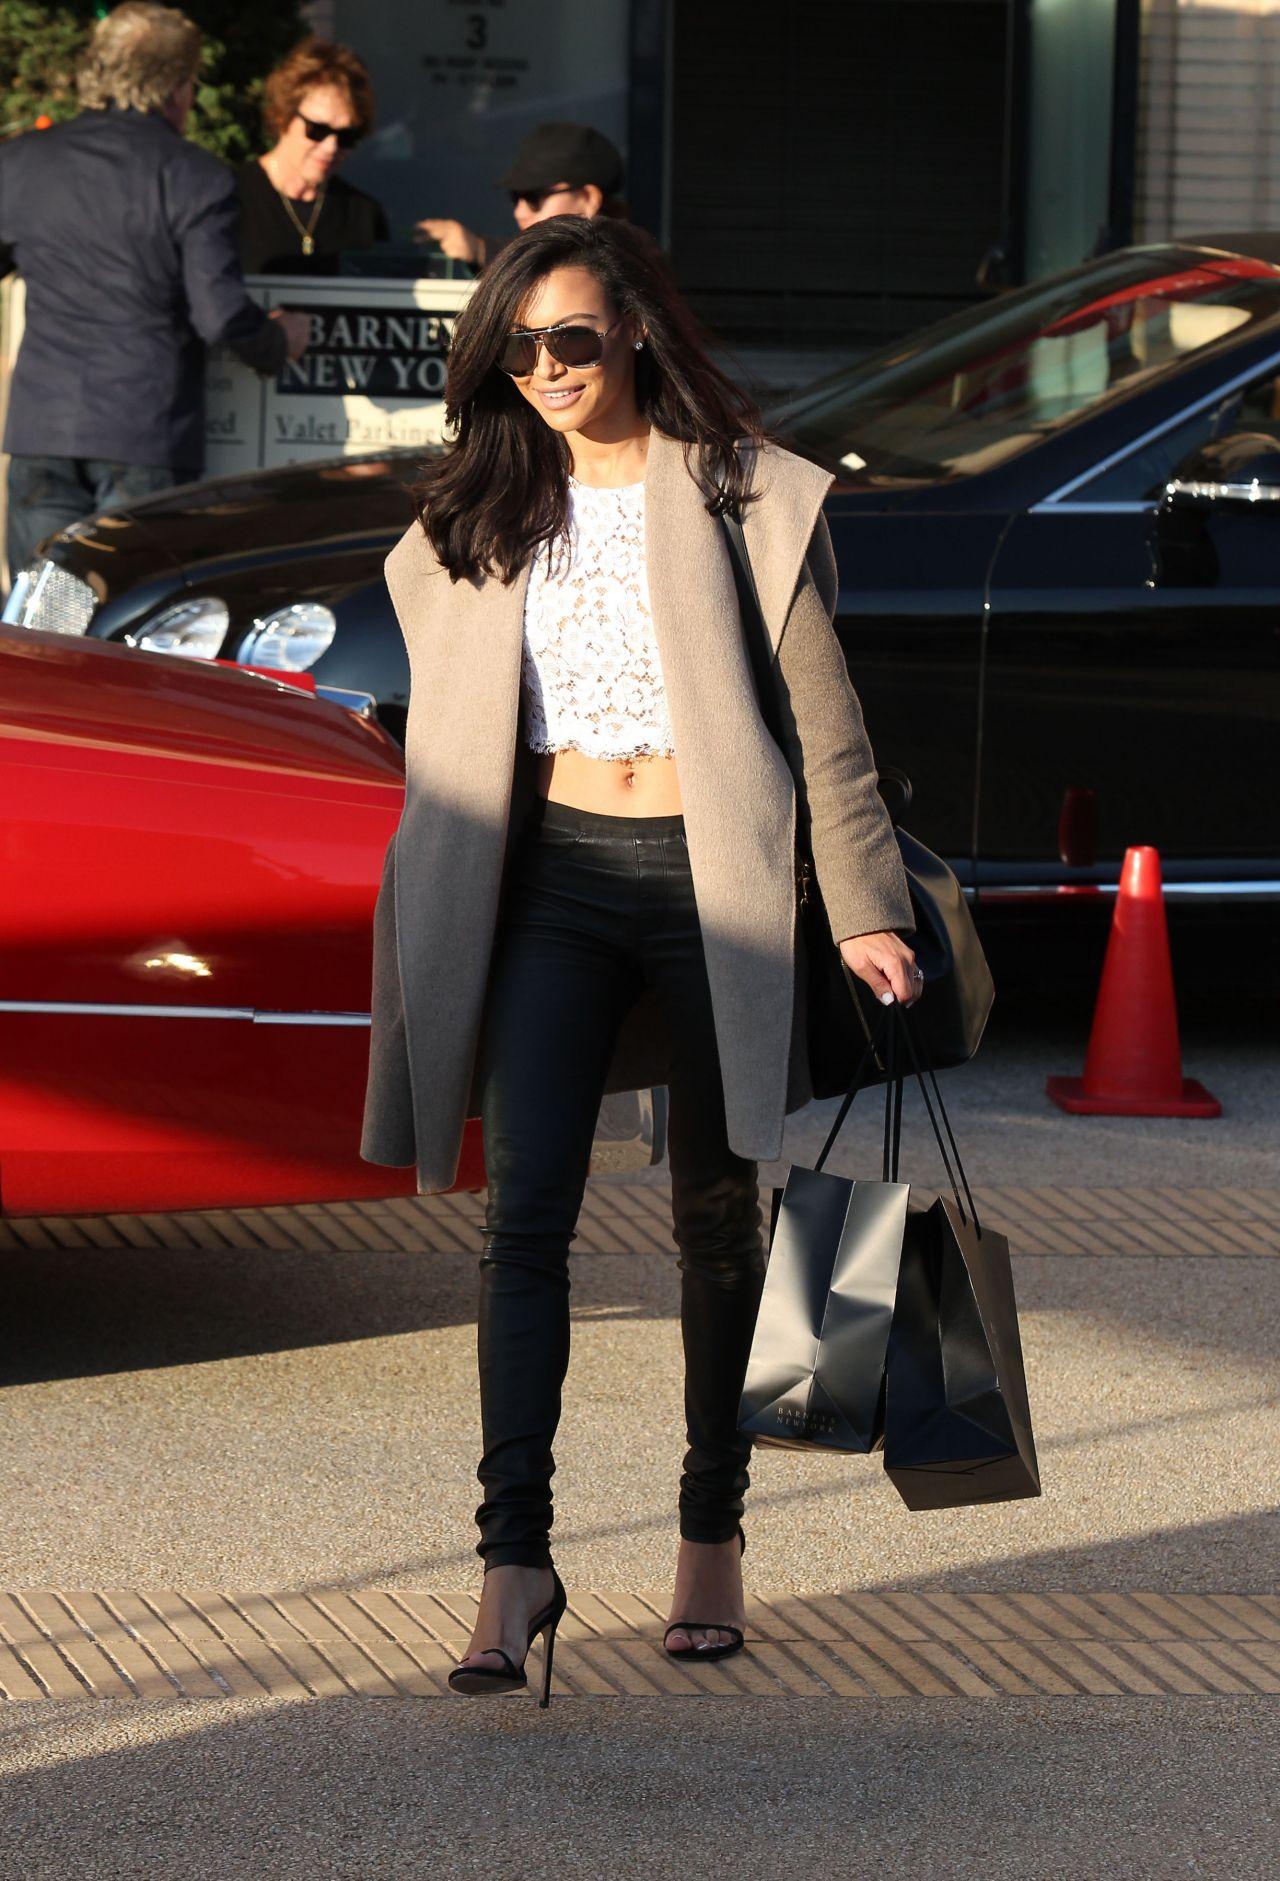 Naya Rivera Street Style Leaving Barneys New York In Los